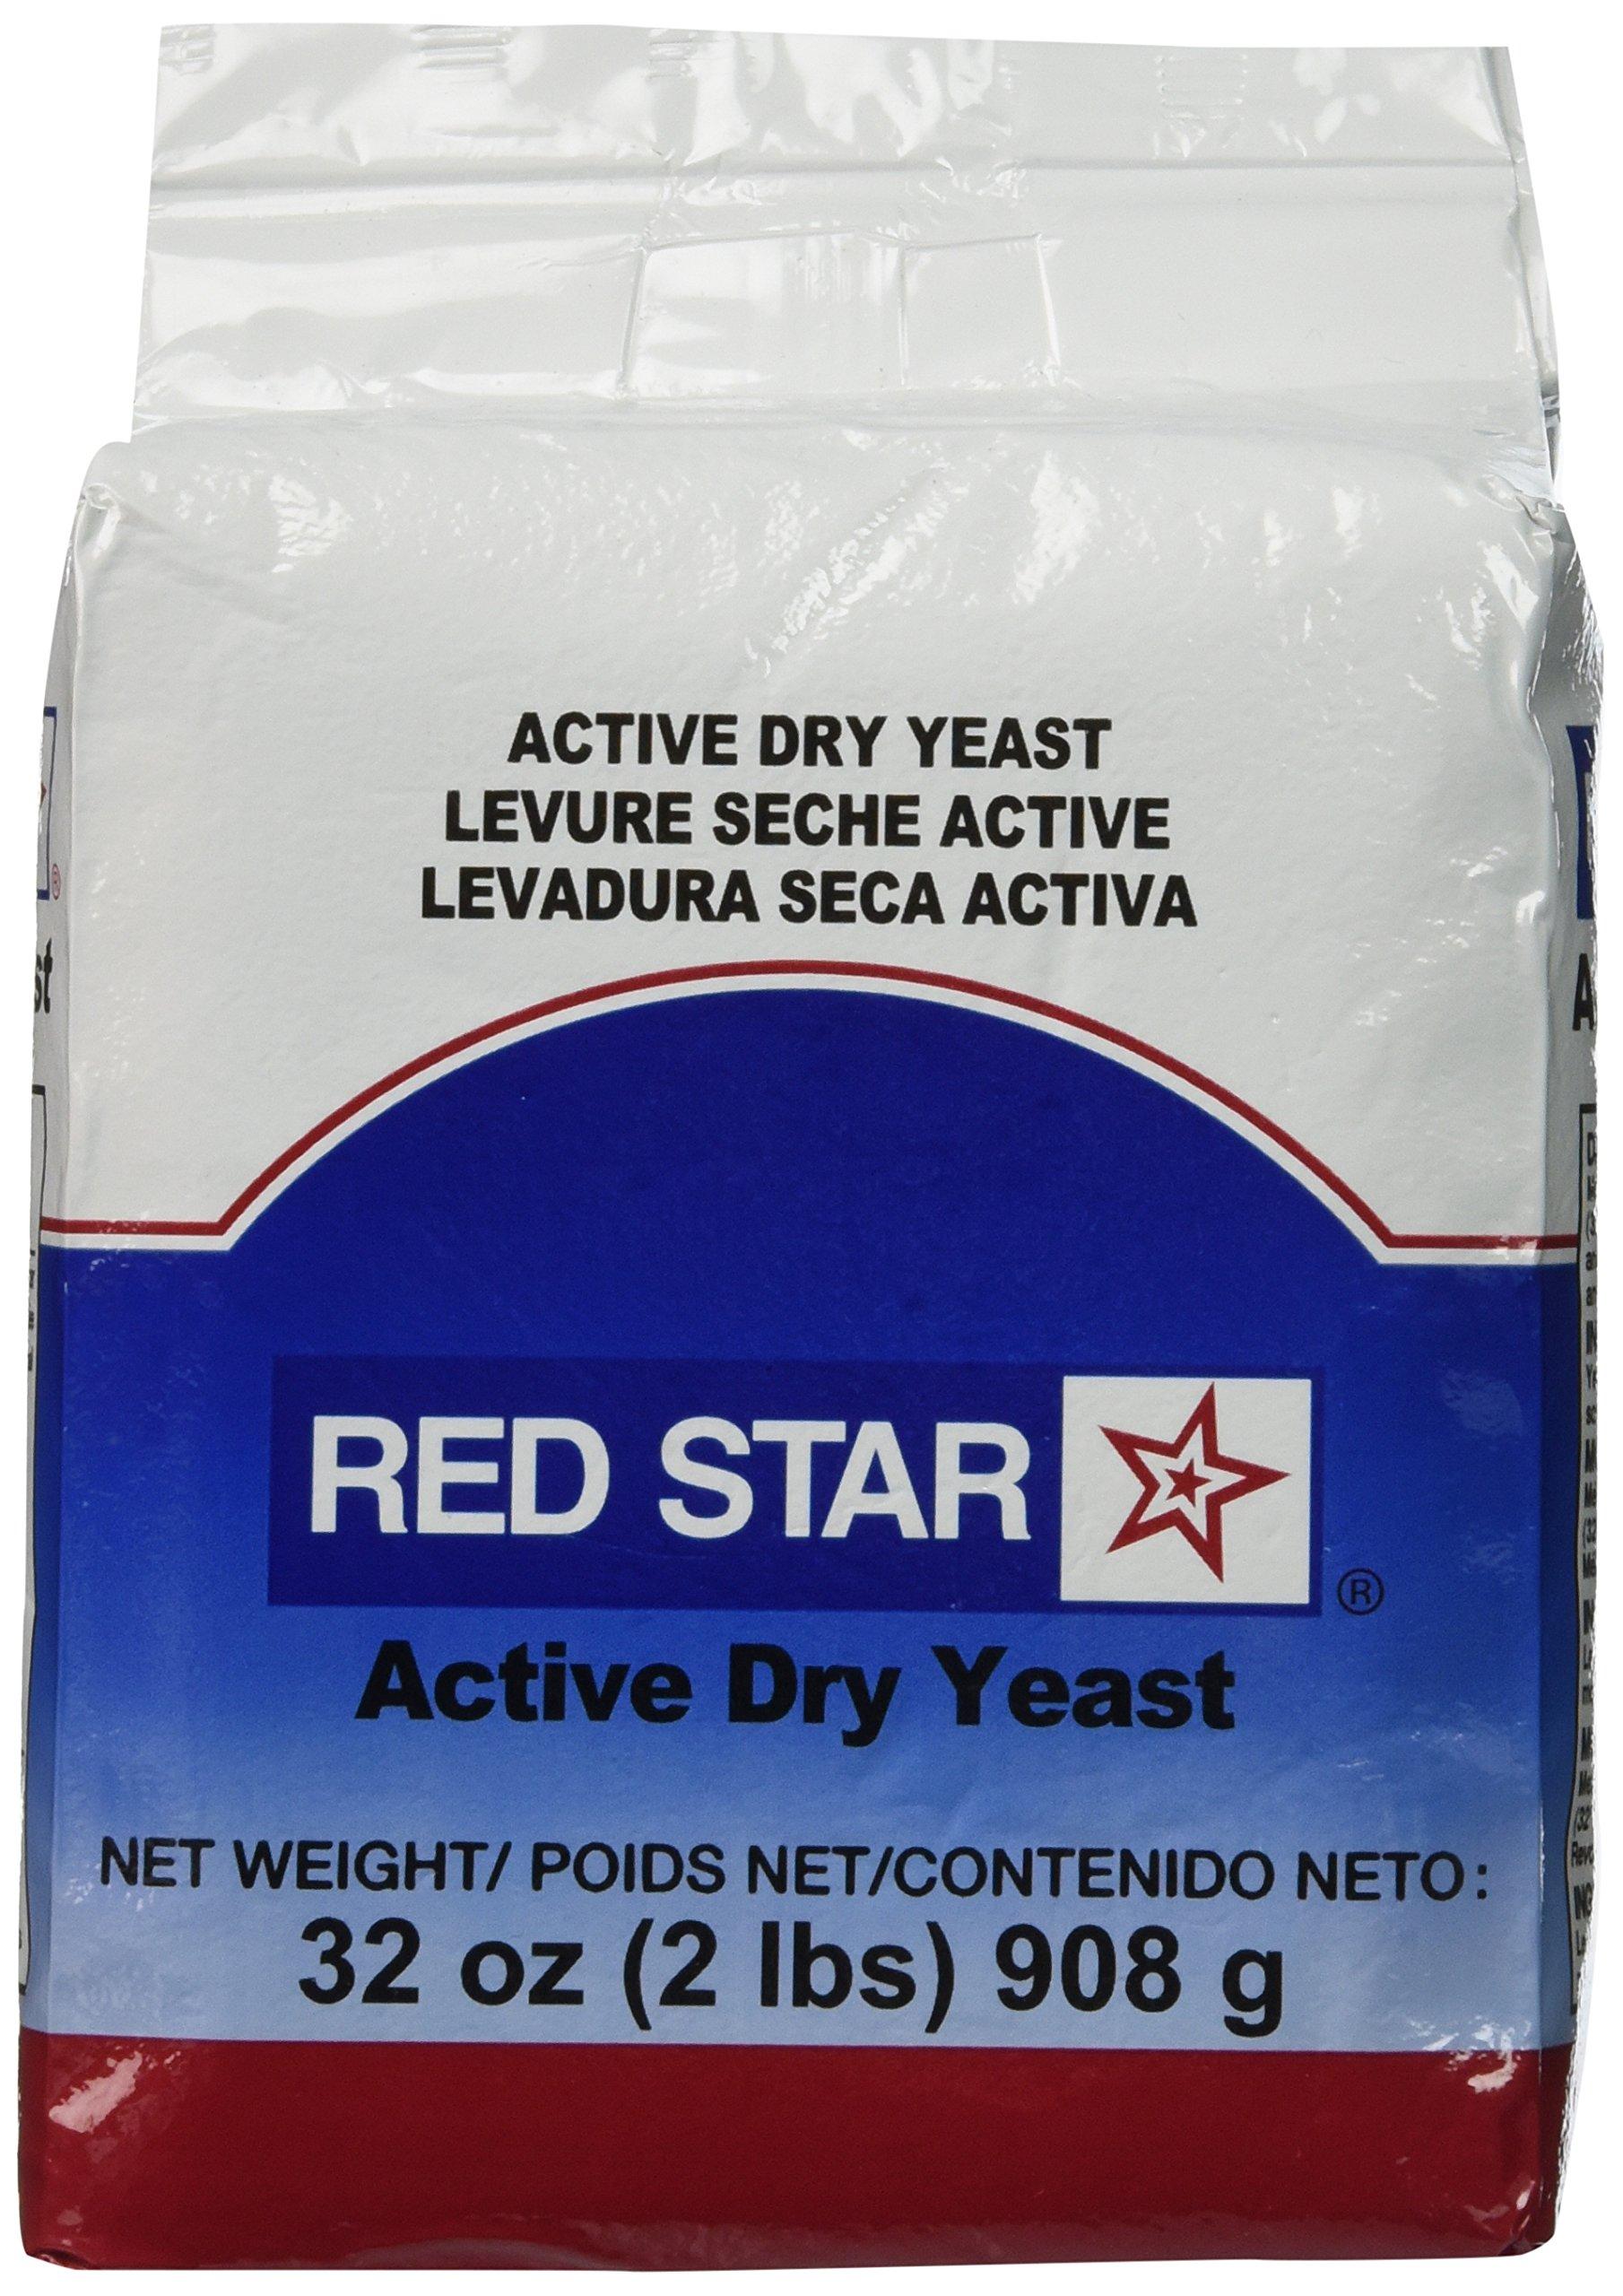 King Arthur Flour Red Star Active Dry Yeast 32 OZ (2 lbs)